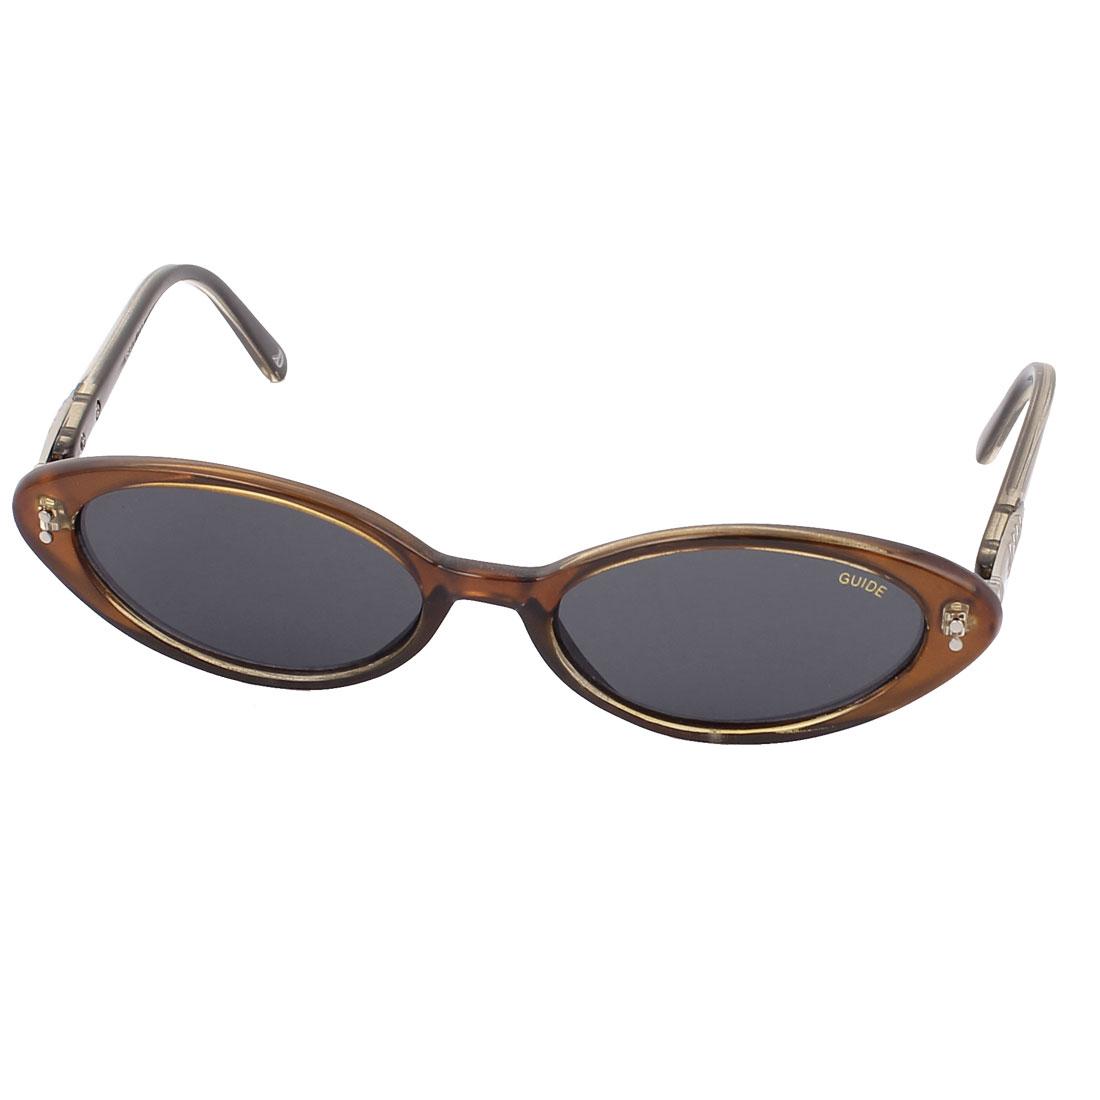 Ladies Full Frame Slim Sunglasses Black Lens Eyewear Glasses